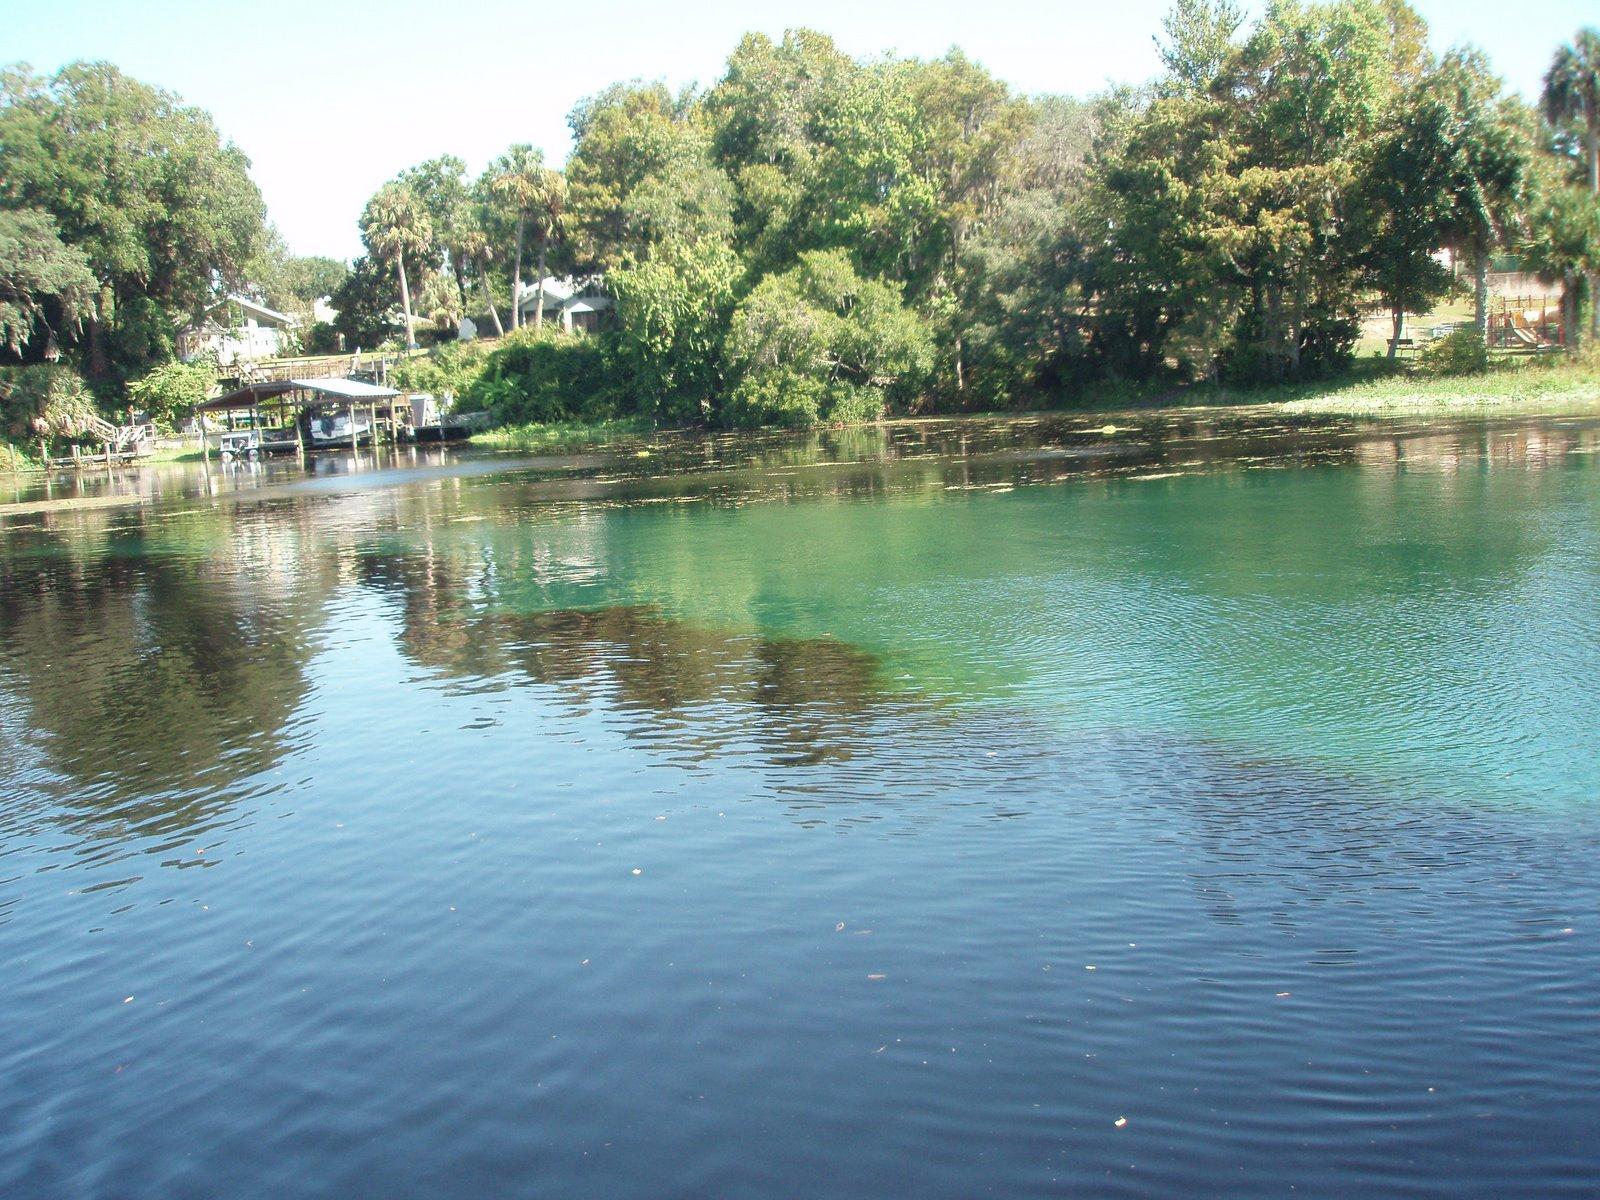 Withlacoochee And Rainbow River Confluence McEntegarts RV Escapades - A long river